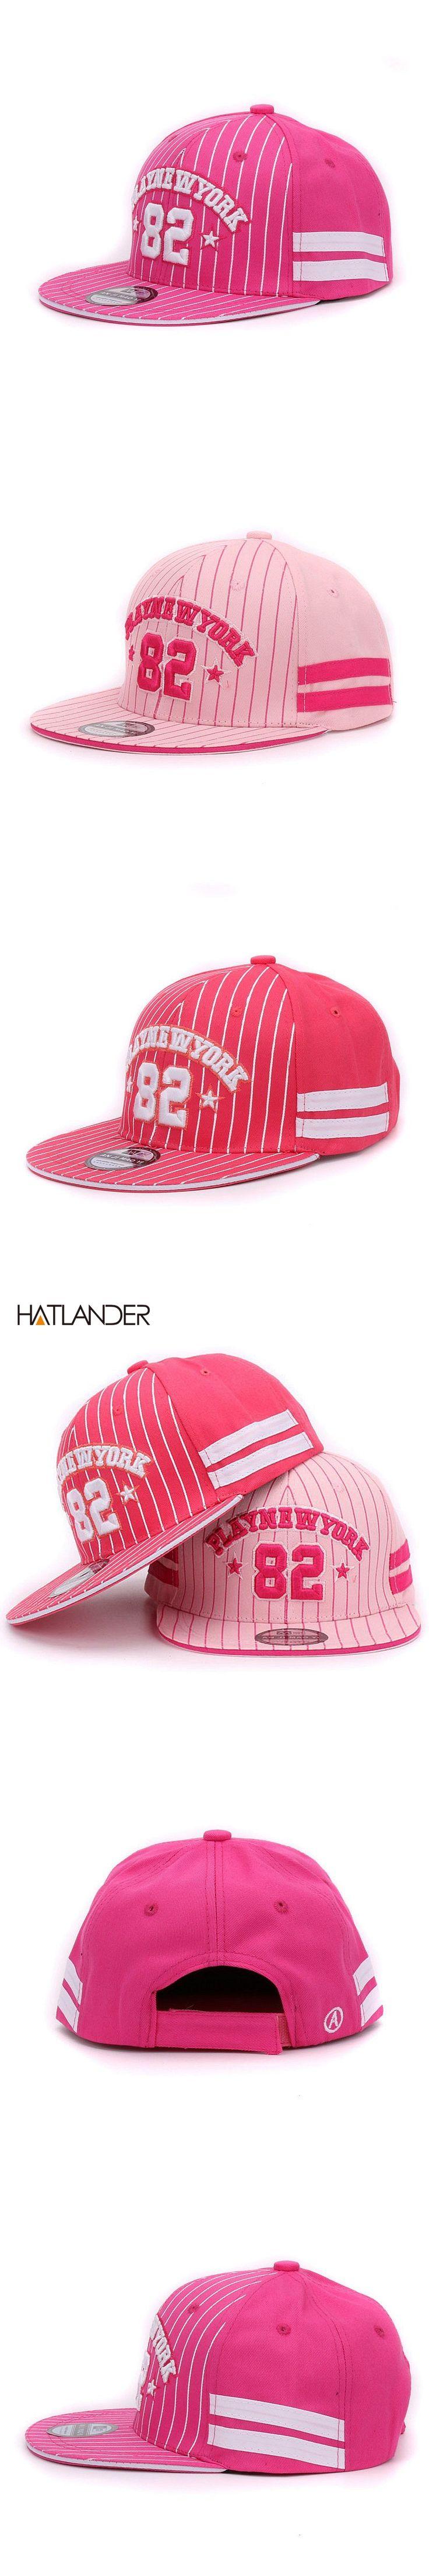 Hatlander Kids baseball cap New York 82 Gorras Children Snapback Hip Hop Caps baby Summer Casual Adjustable Flat Hat For Girl